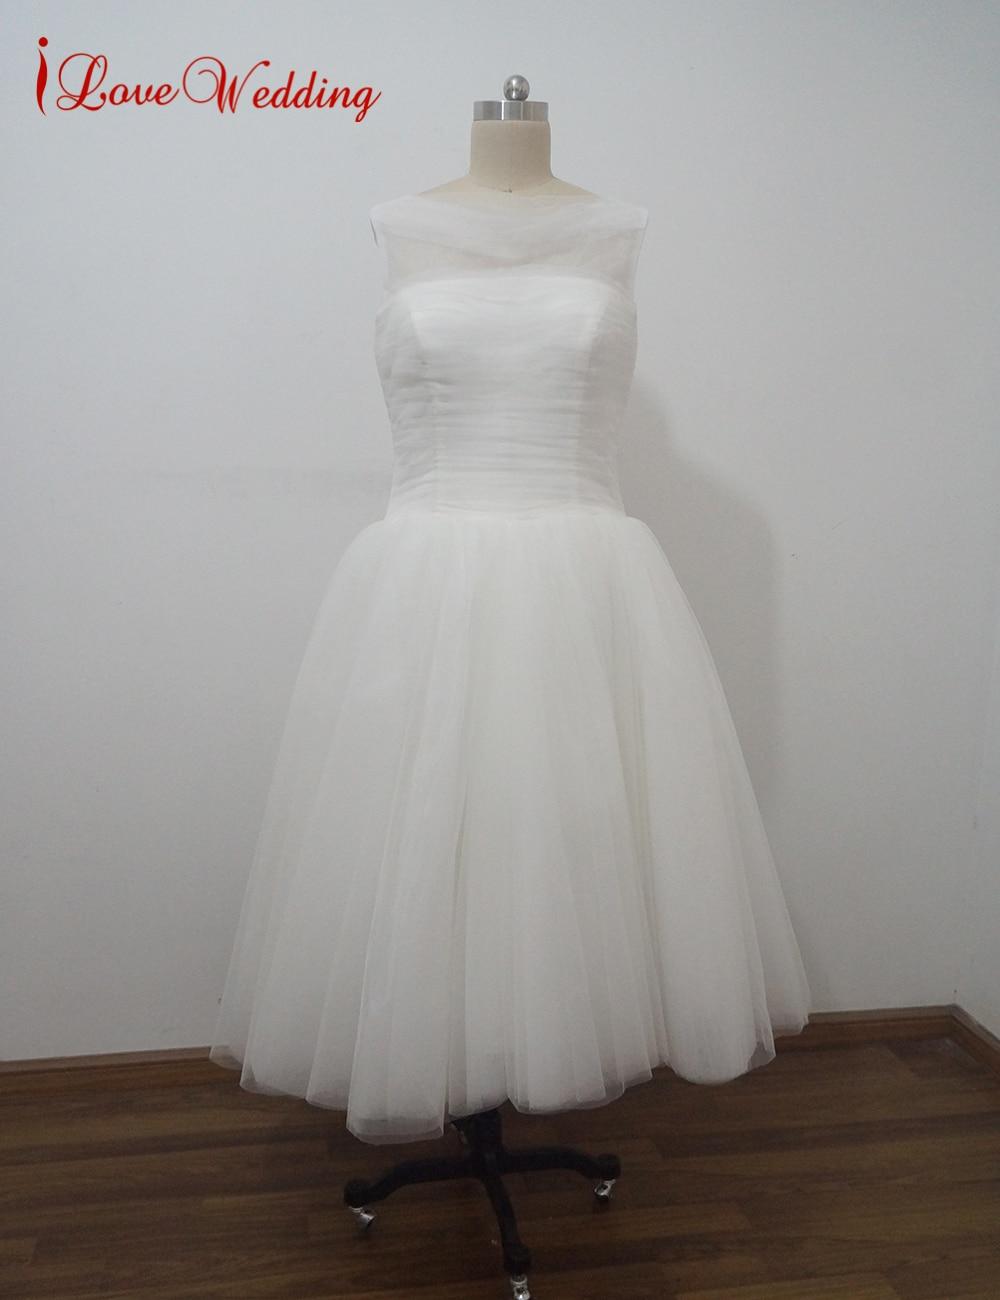 Ilovewedding new vintage 1950s wedding dresses o neckline for I love wedding dresses